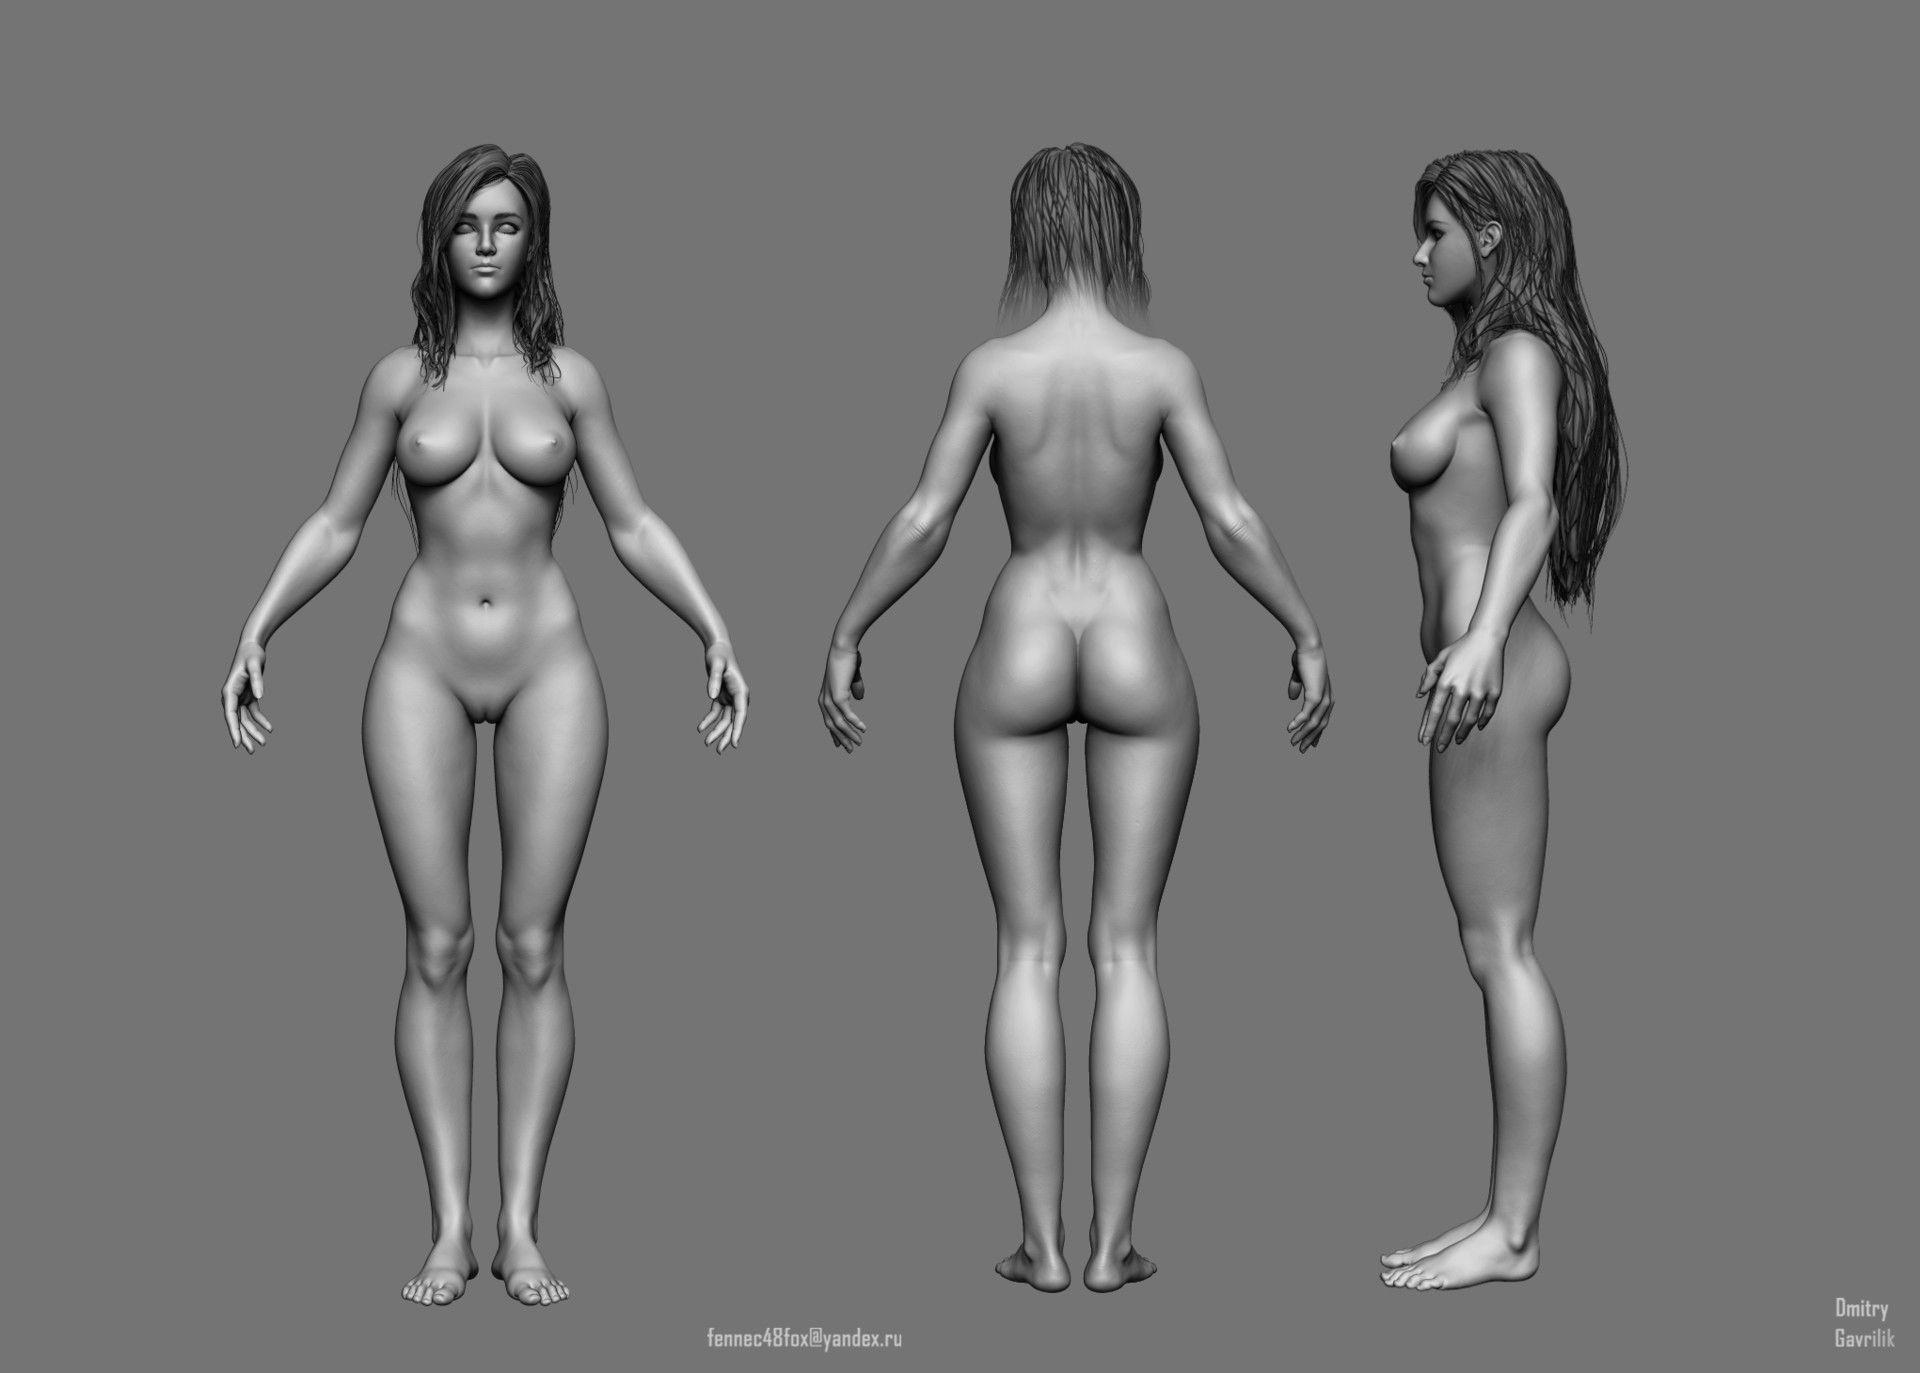 Male anatomy and nude